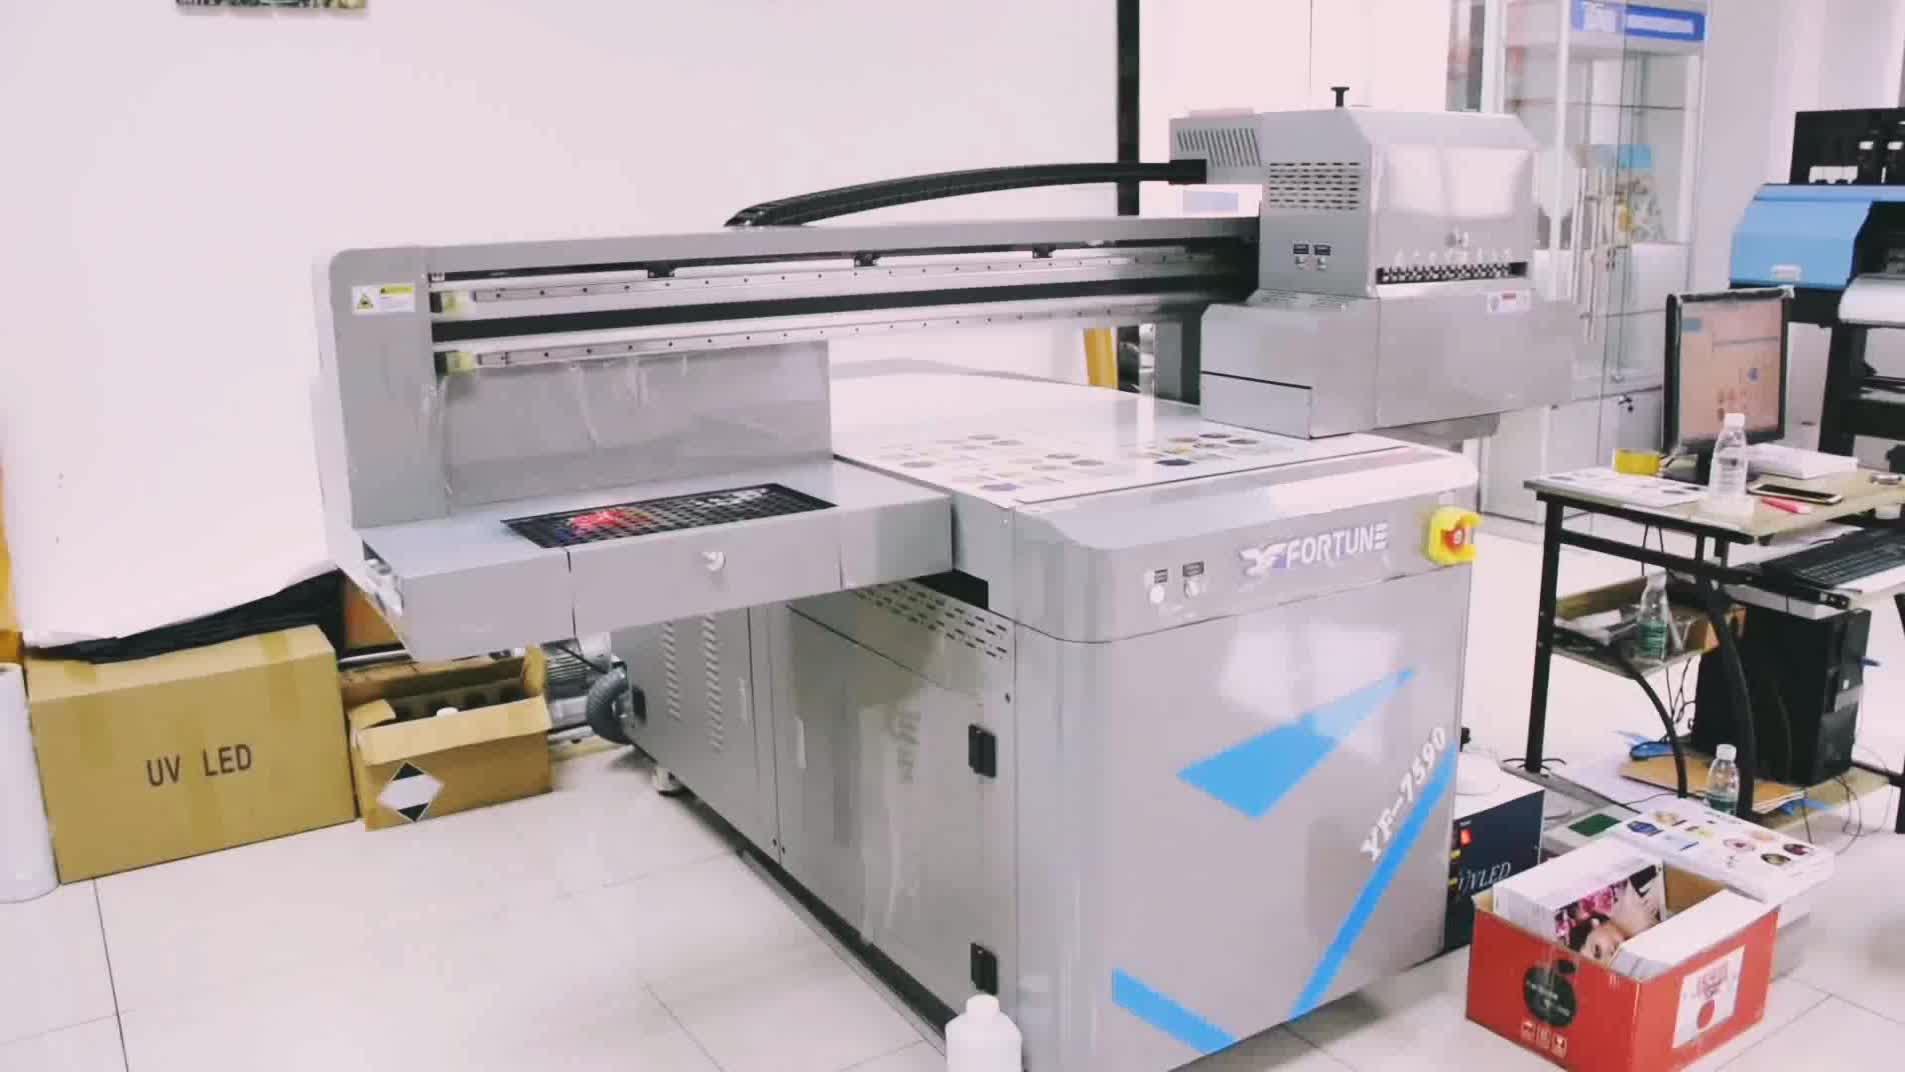 Fortuin uv lak printer met Toshiba printkop 7590 uv flatbed printer